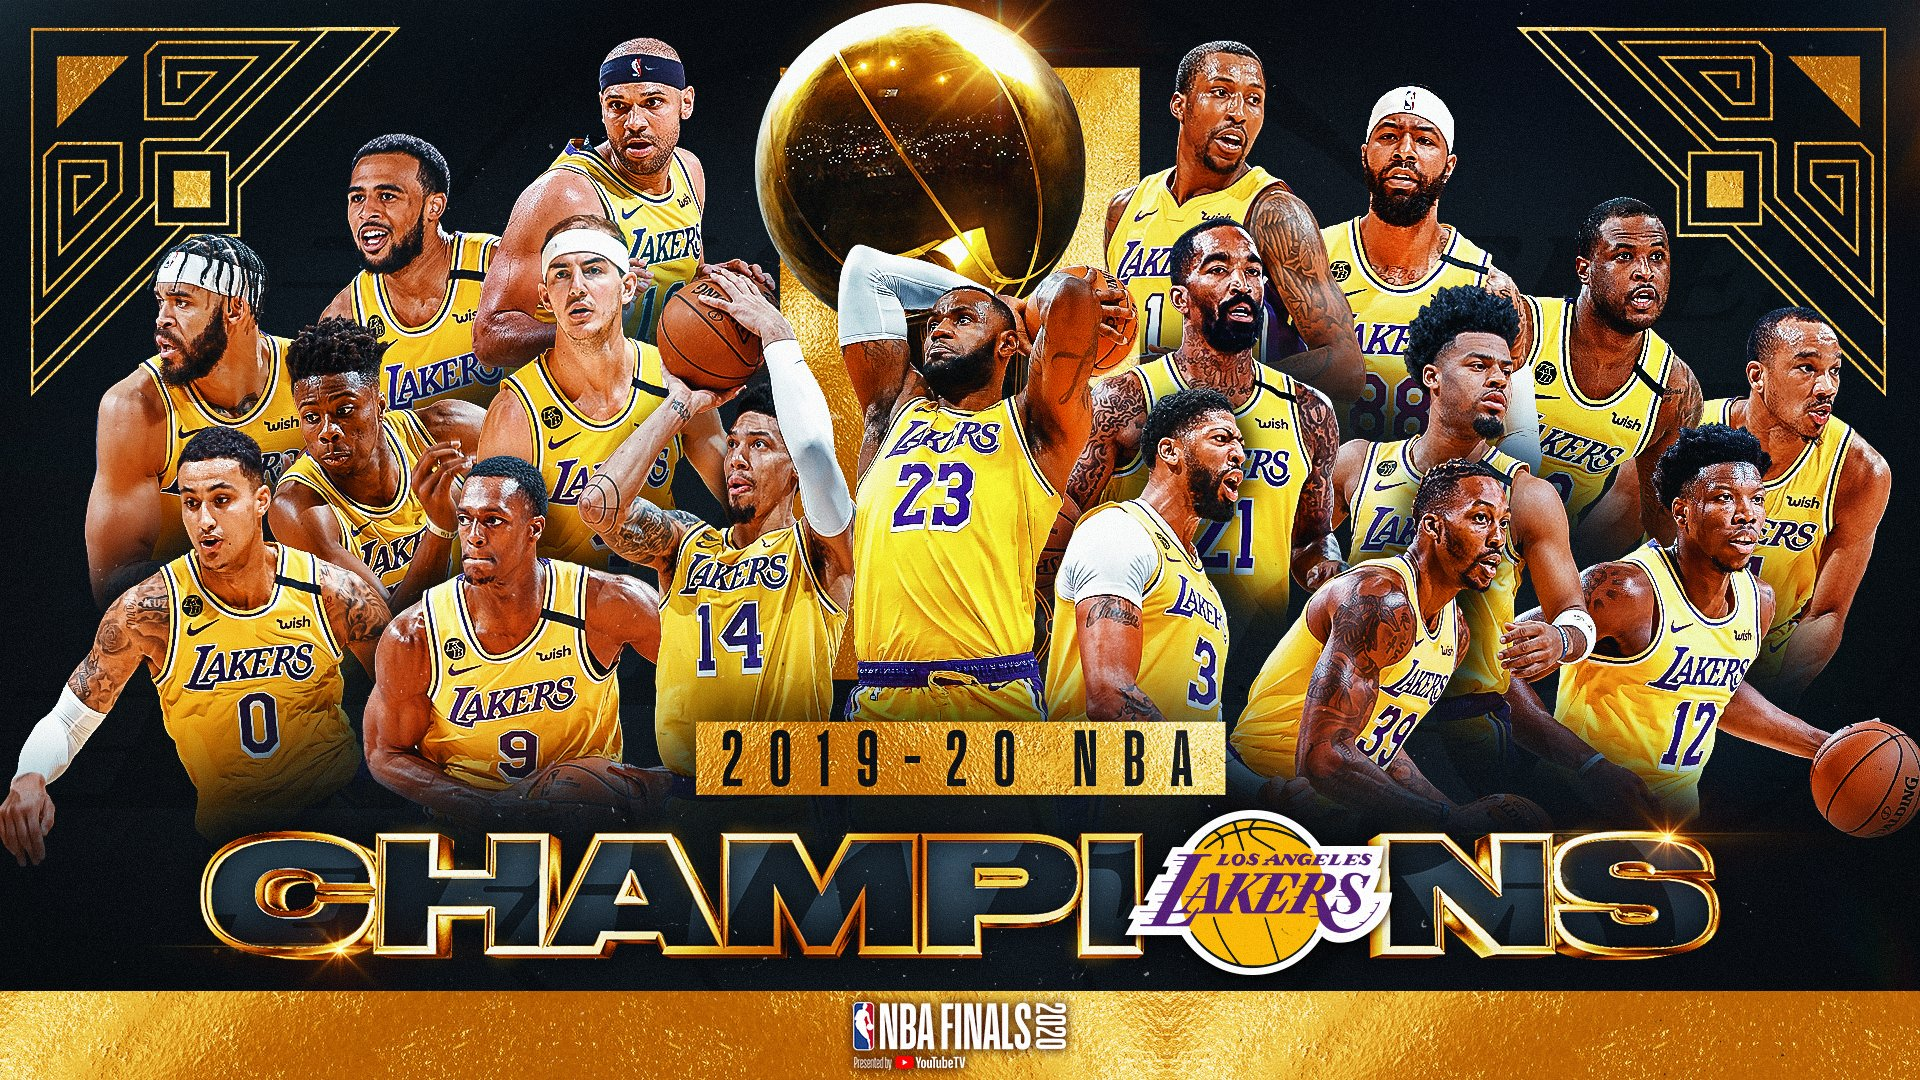 Los Angeles Lakers Nba Champions Wallpapers Trumpwallpapers